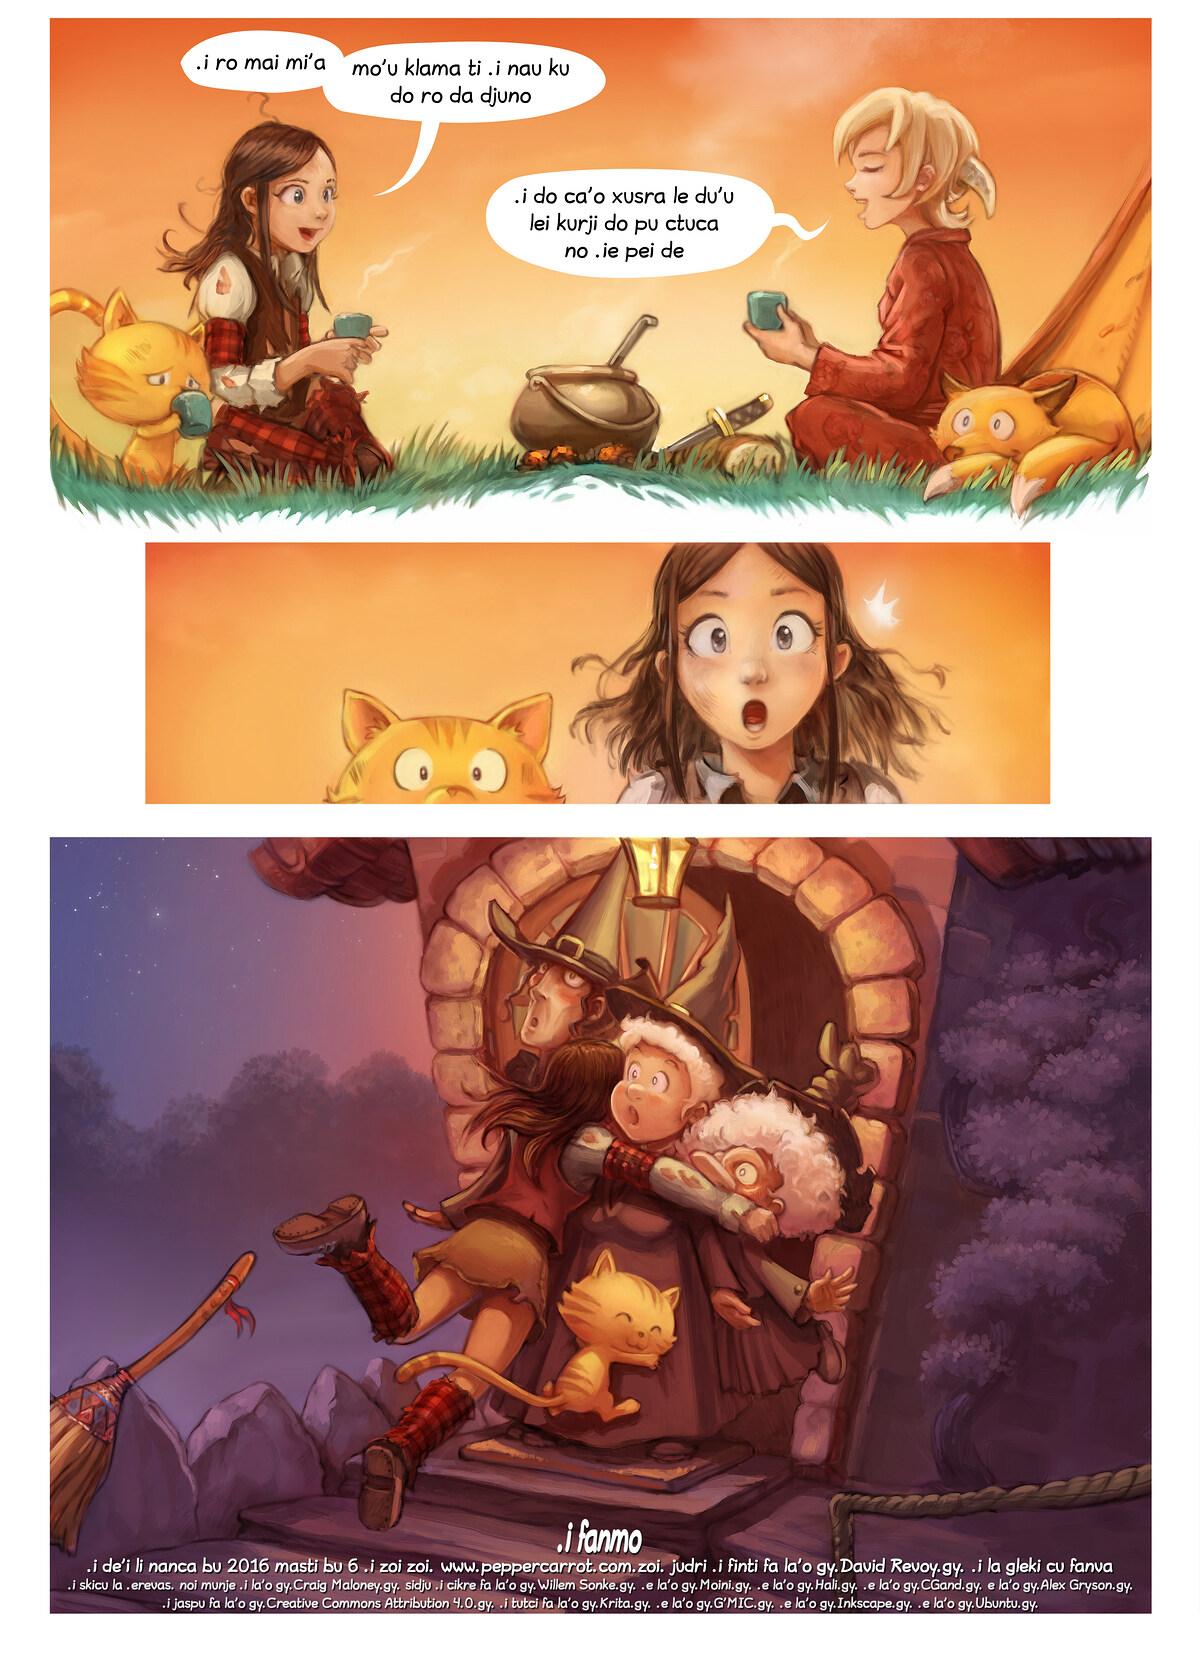 A webcomic page of Pepper&Carrot, pagbu 17 [jb], papri 7